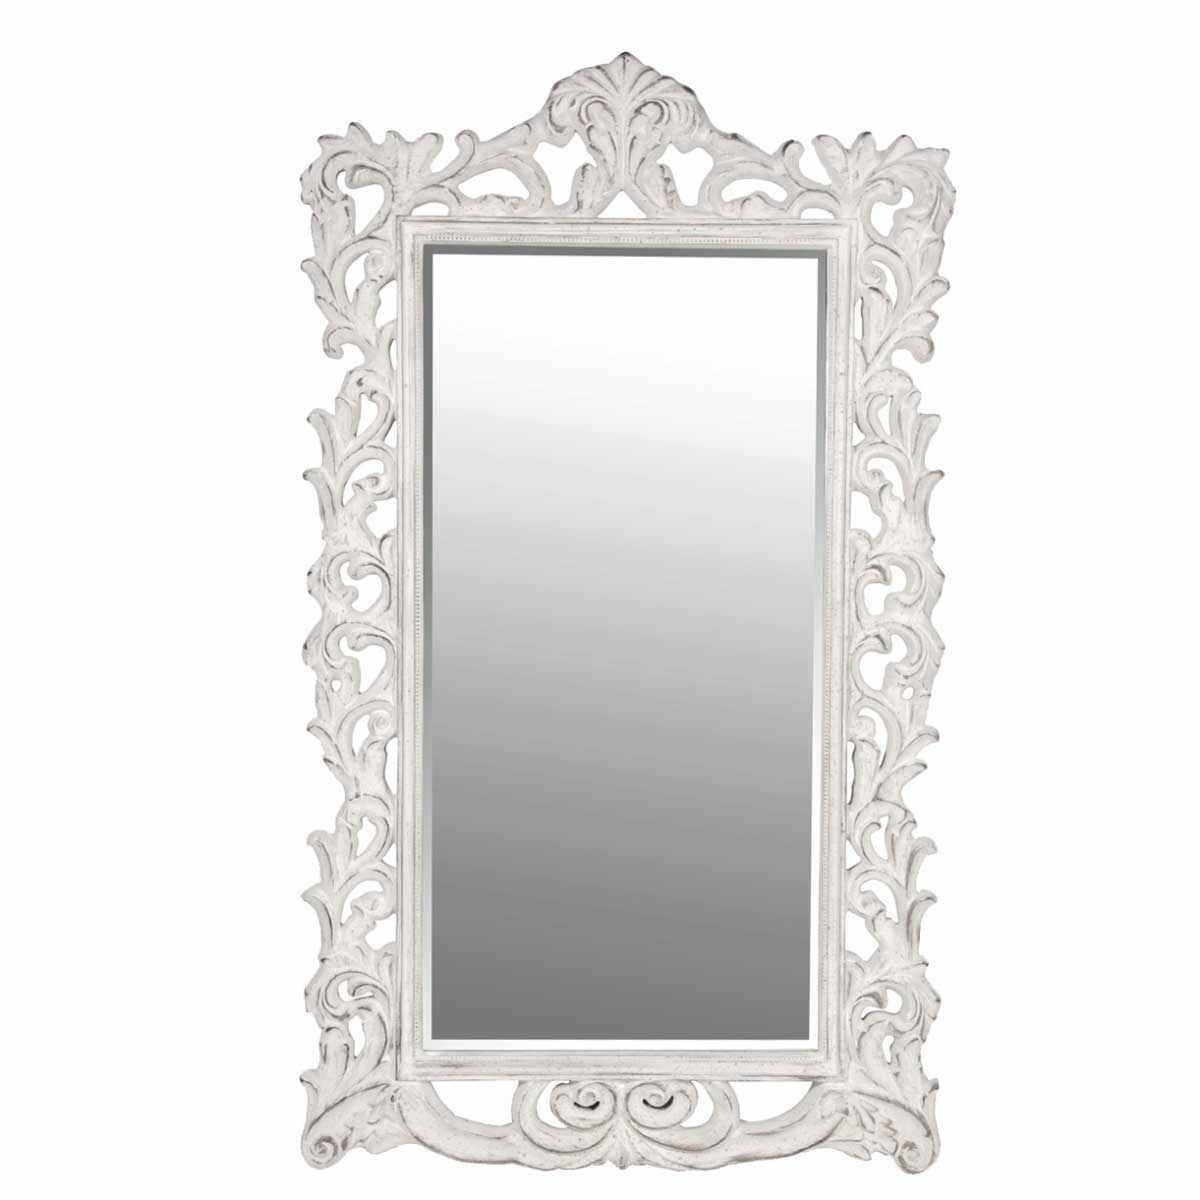 Homeware: Oval Full Length Standing Mirror | Large Floor Mirrors for Cream Standing Mirrors (Image 19 of 25)